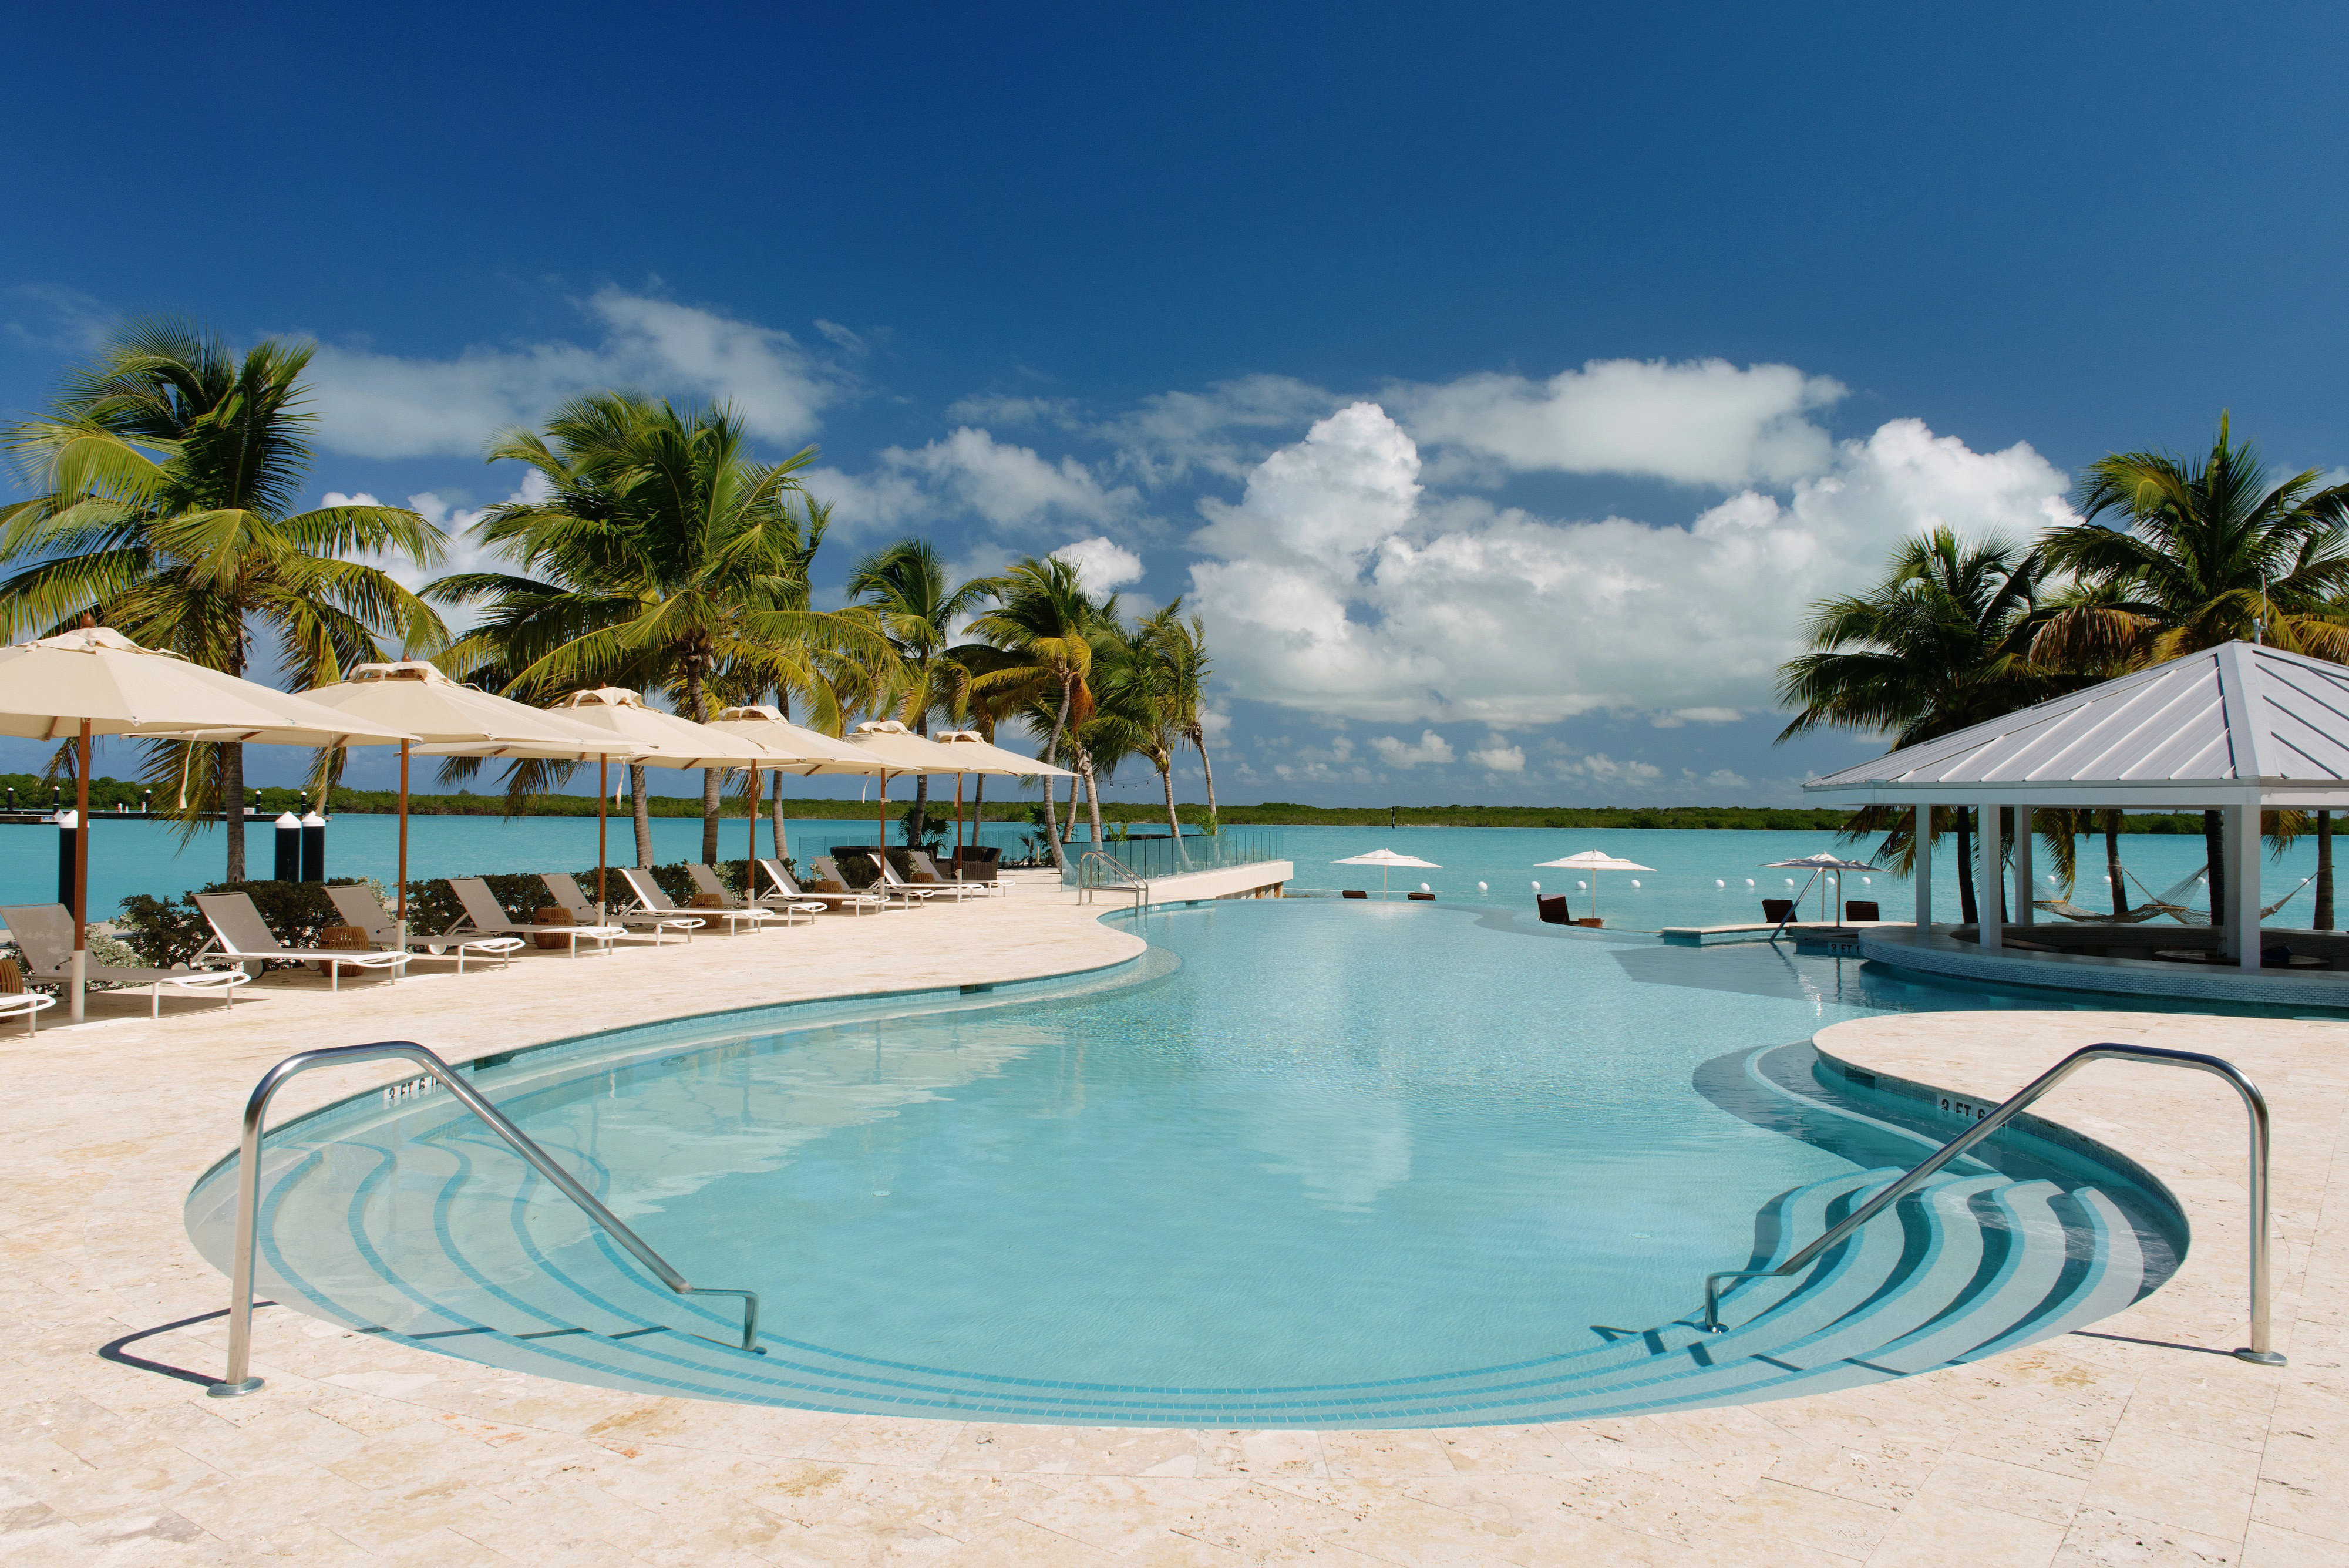 Beachfront Grounds Play Pool Resort sky swimming pool leisure Beach property caribbean Lagoon Ocean Sea shore Villa swimming sandy day